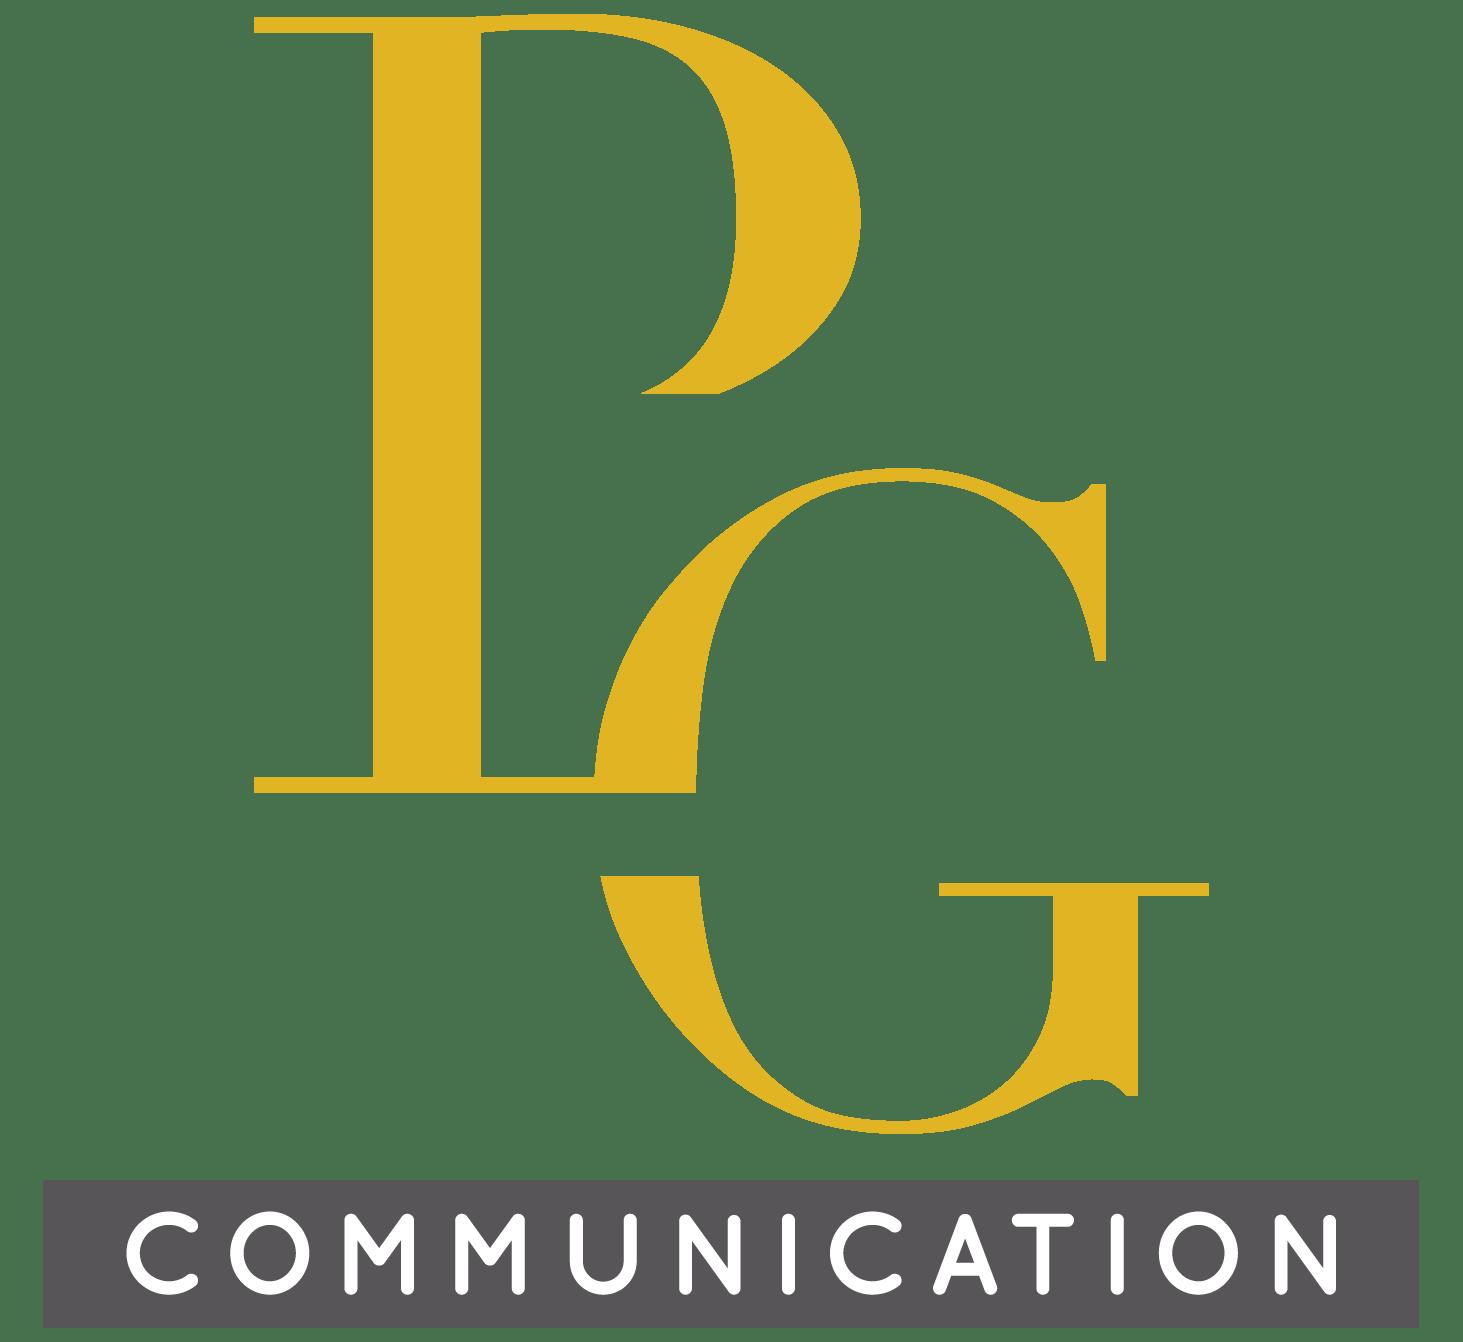 pg communication